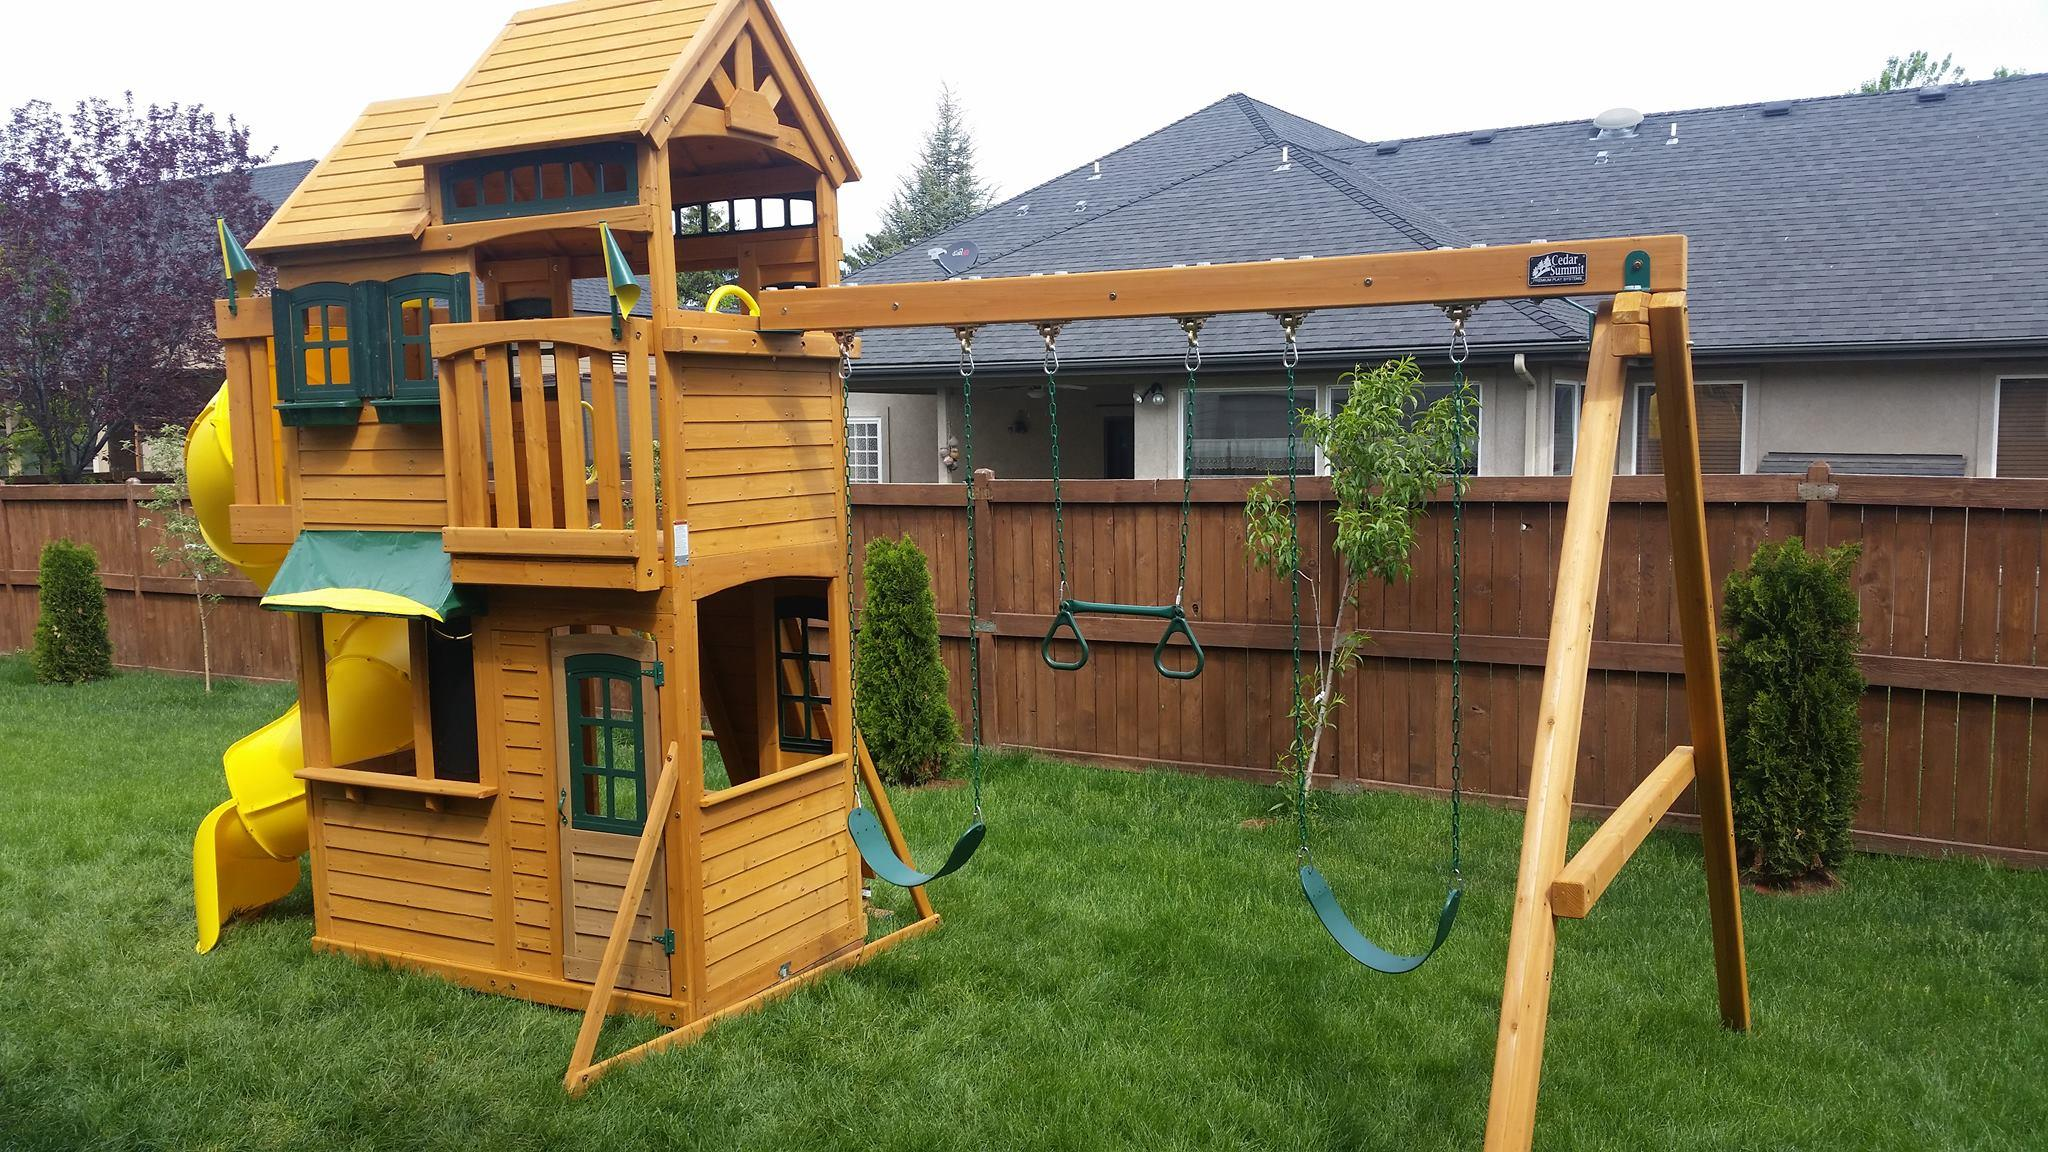 Boise Carpentry Amp Handyman Services In Boise Id 208